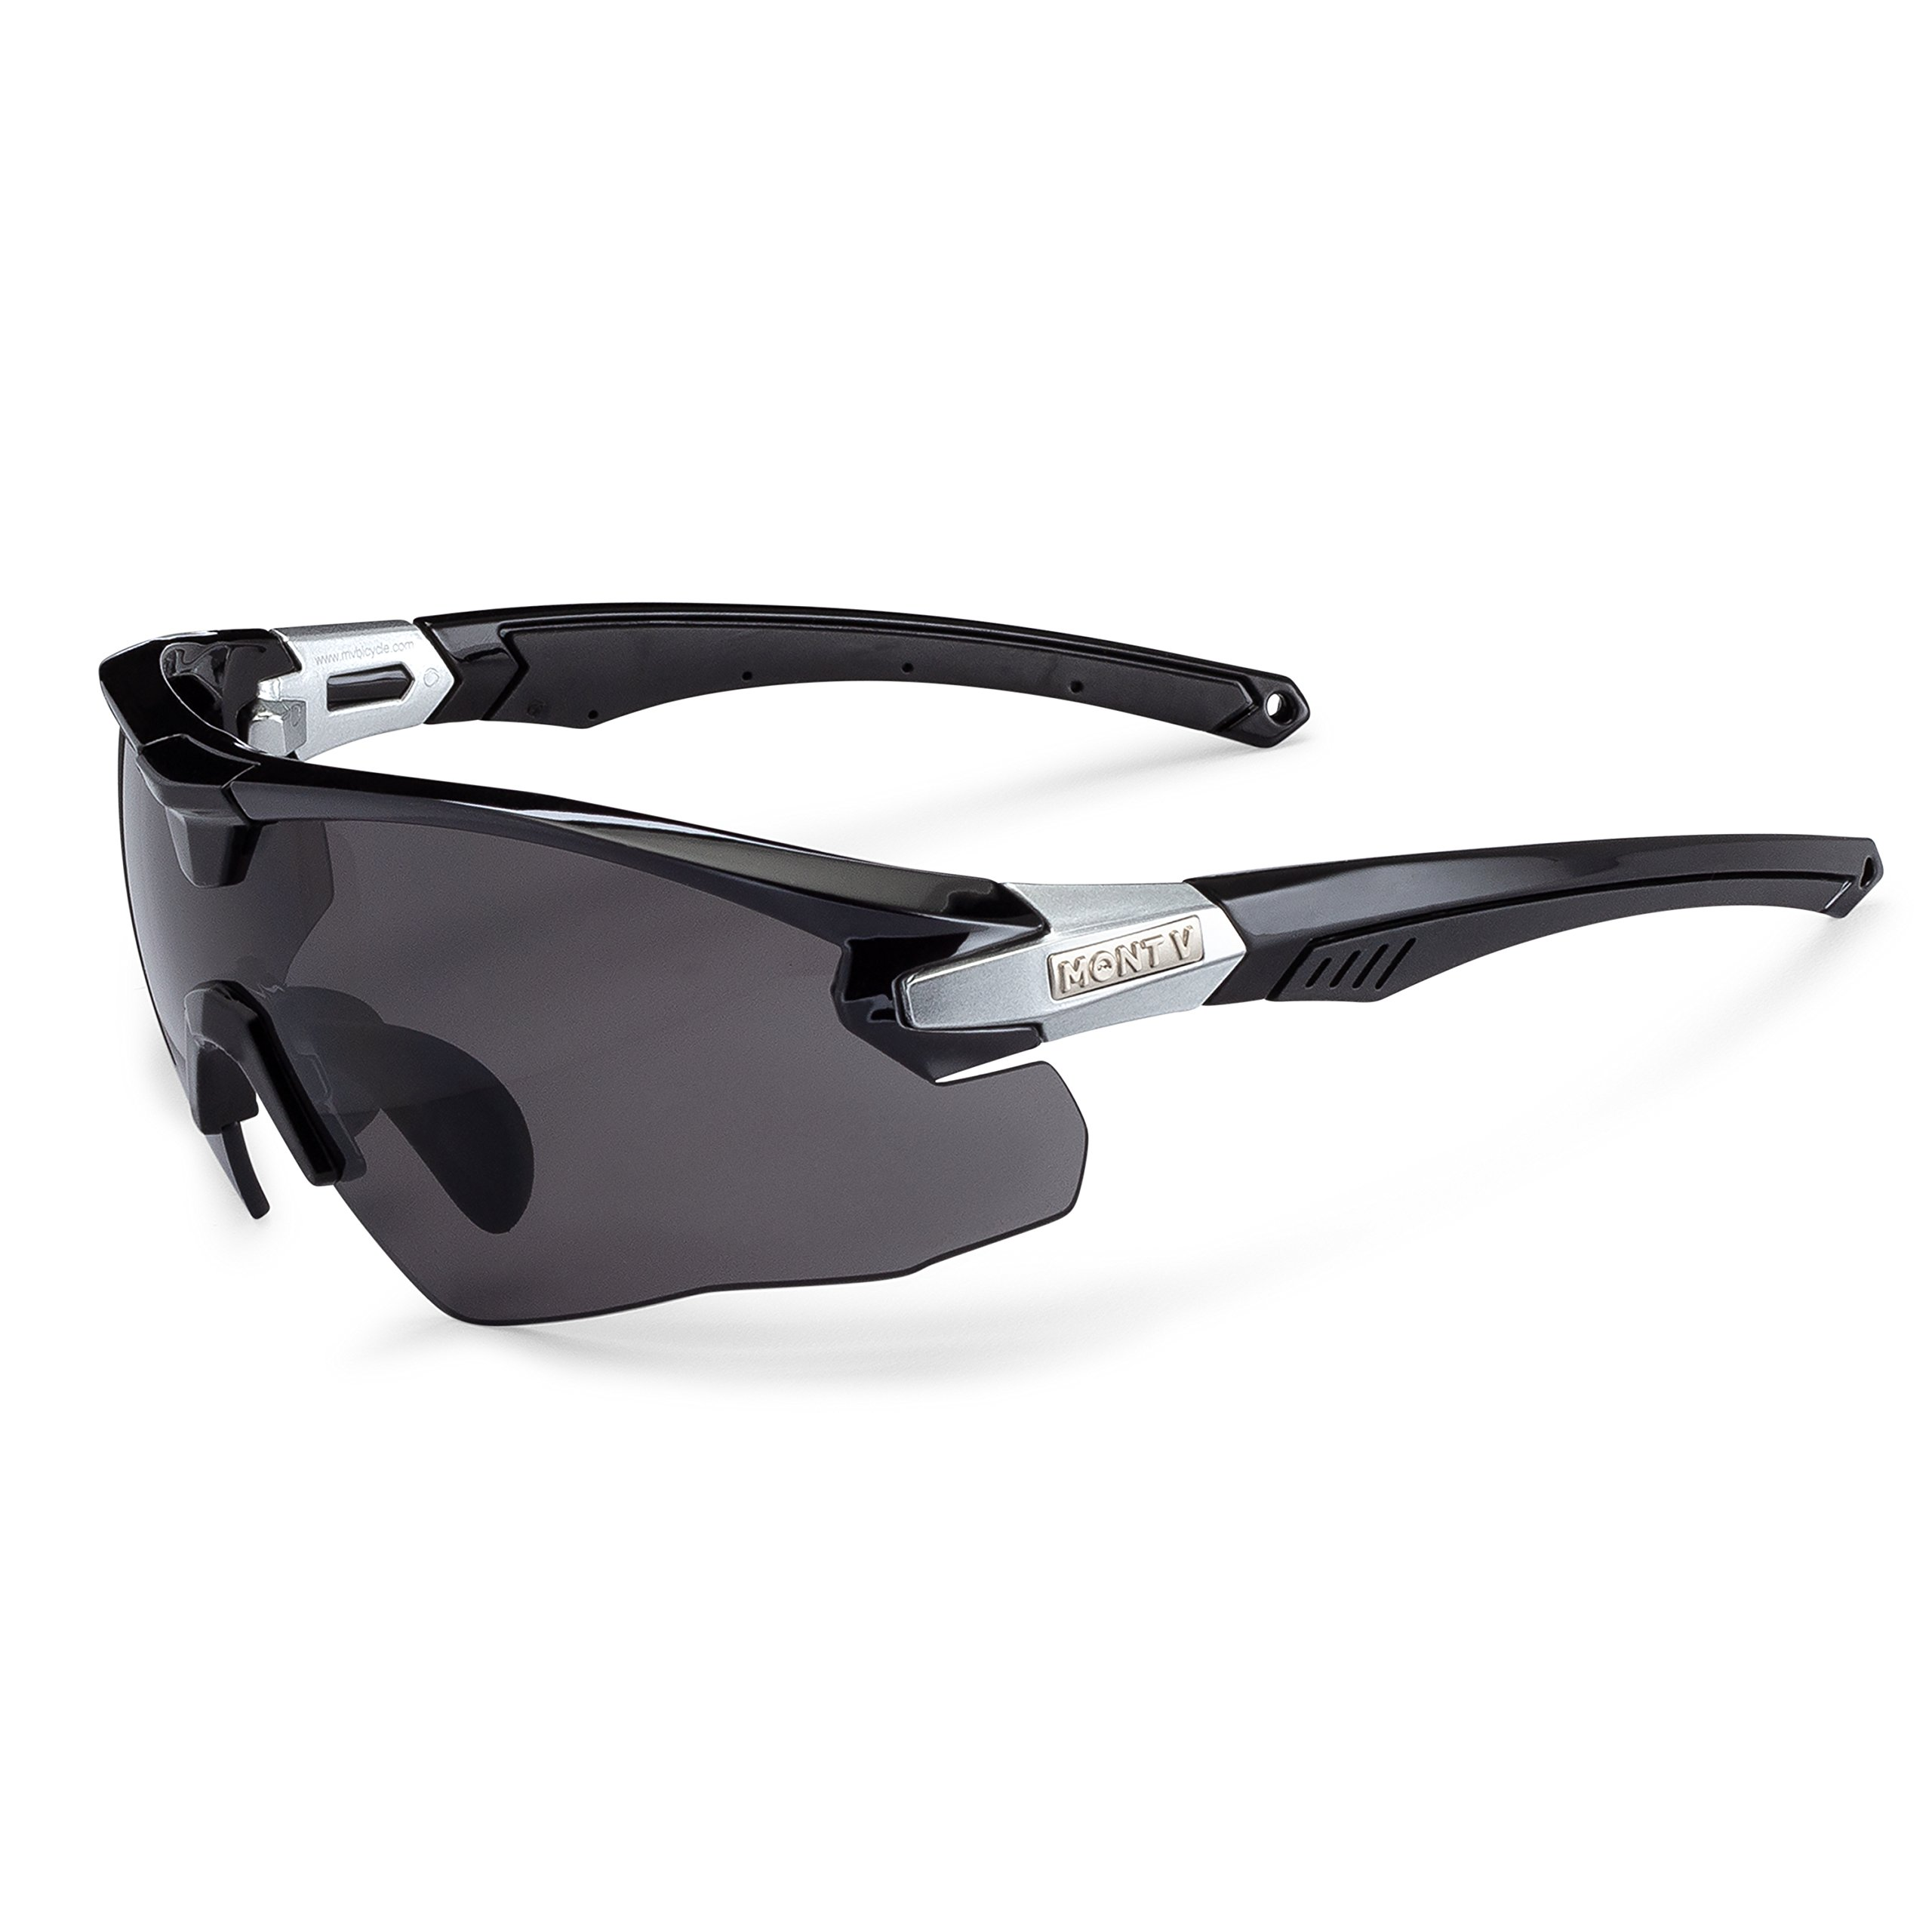 9676d8e711a Mont Ventoux Sport Sunglasses for Women Men - Cycling Running Shooting Golf  Fishing Baseball Driving Hiking ...